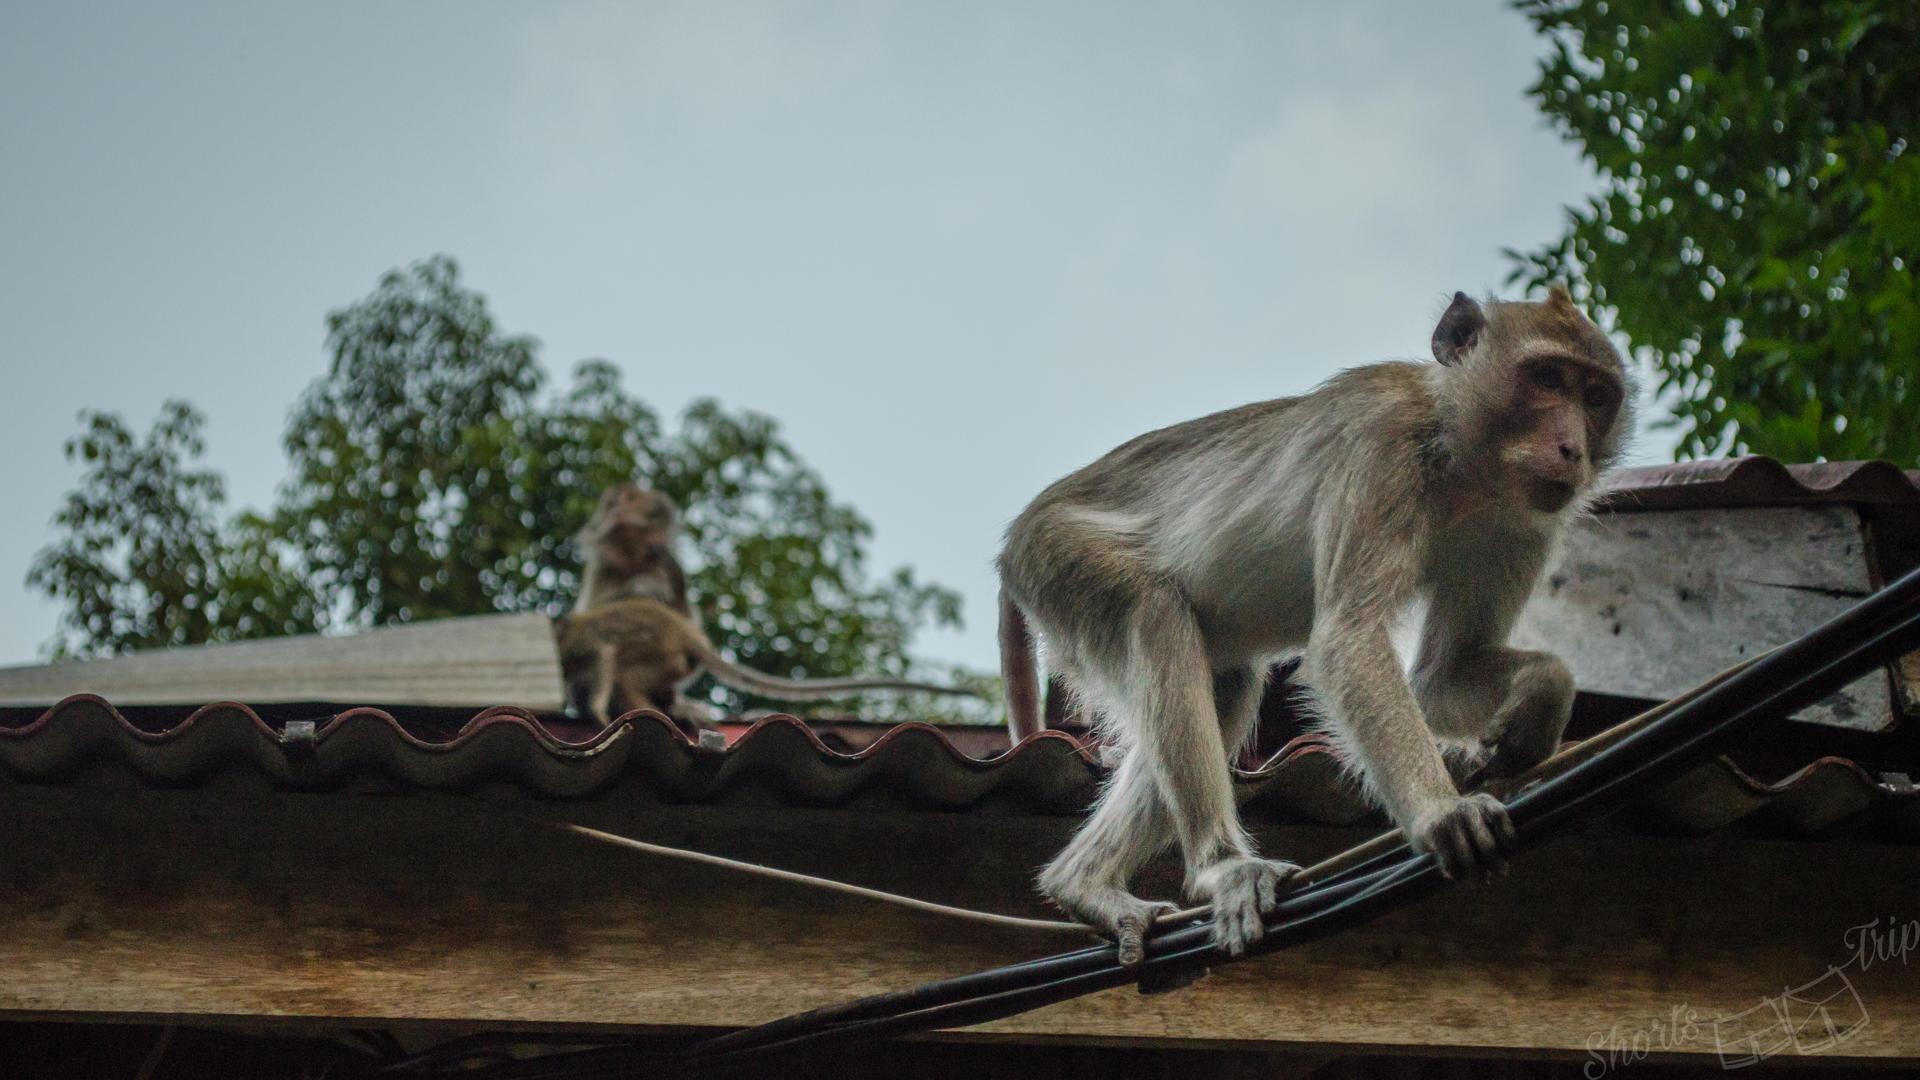 khao sok monkey, khao sok island resort monkey, monkey